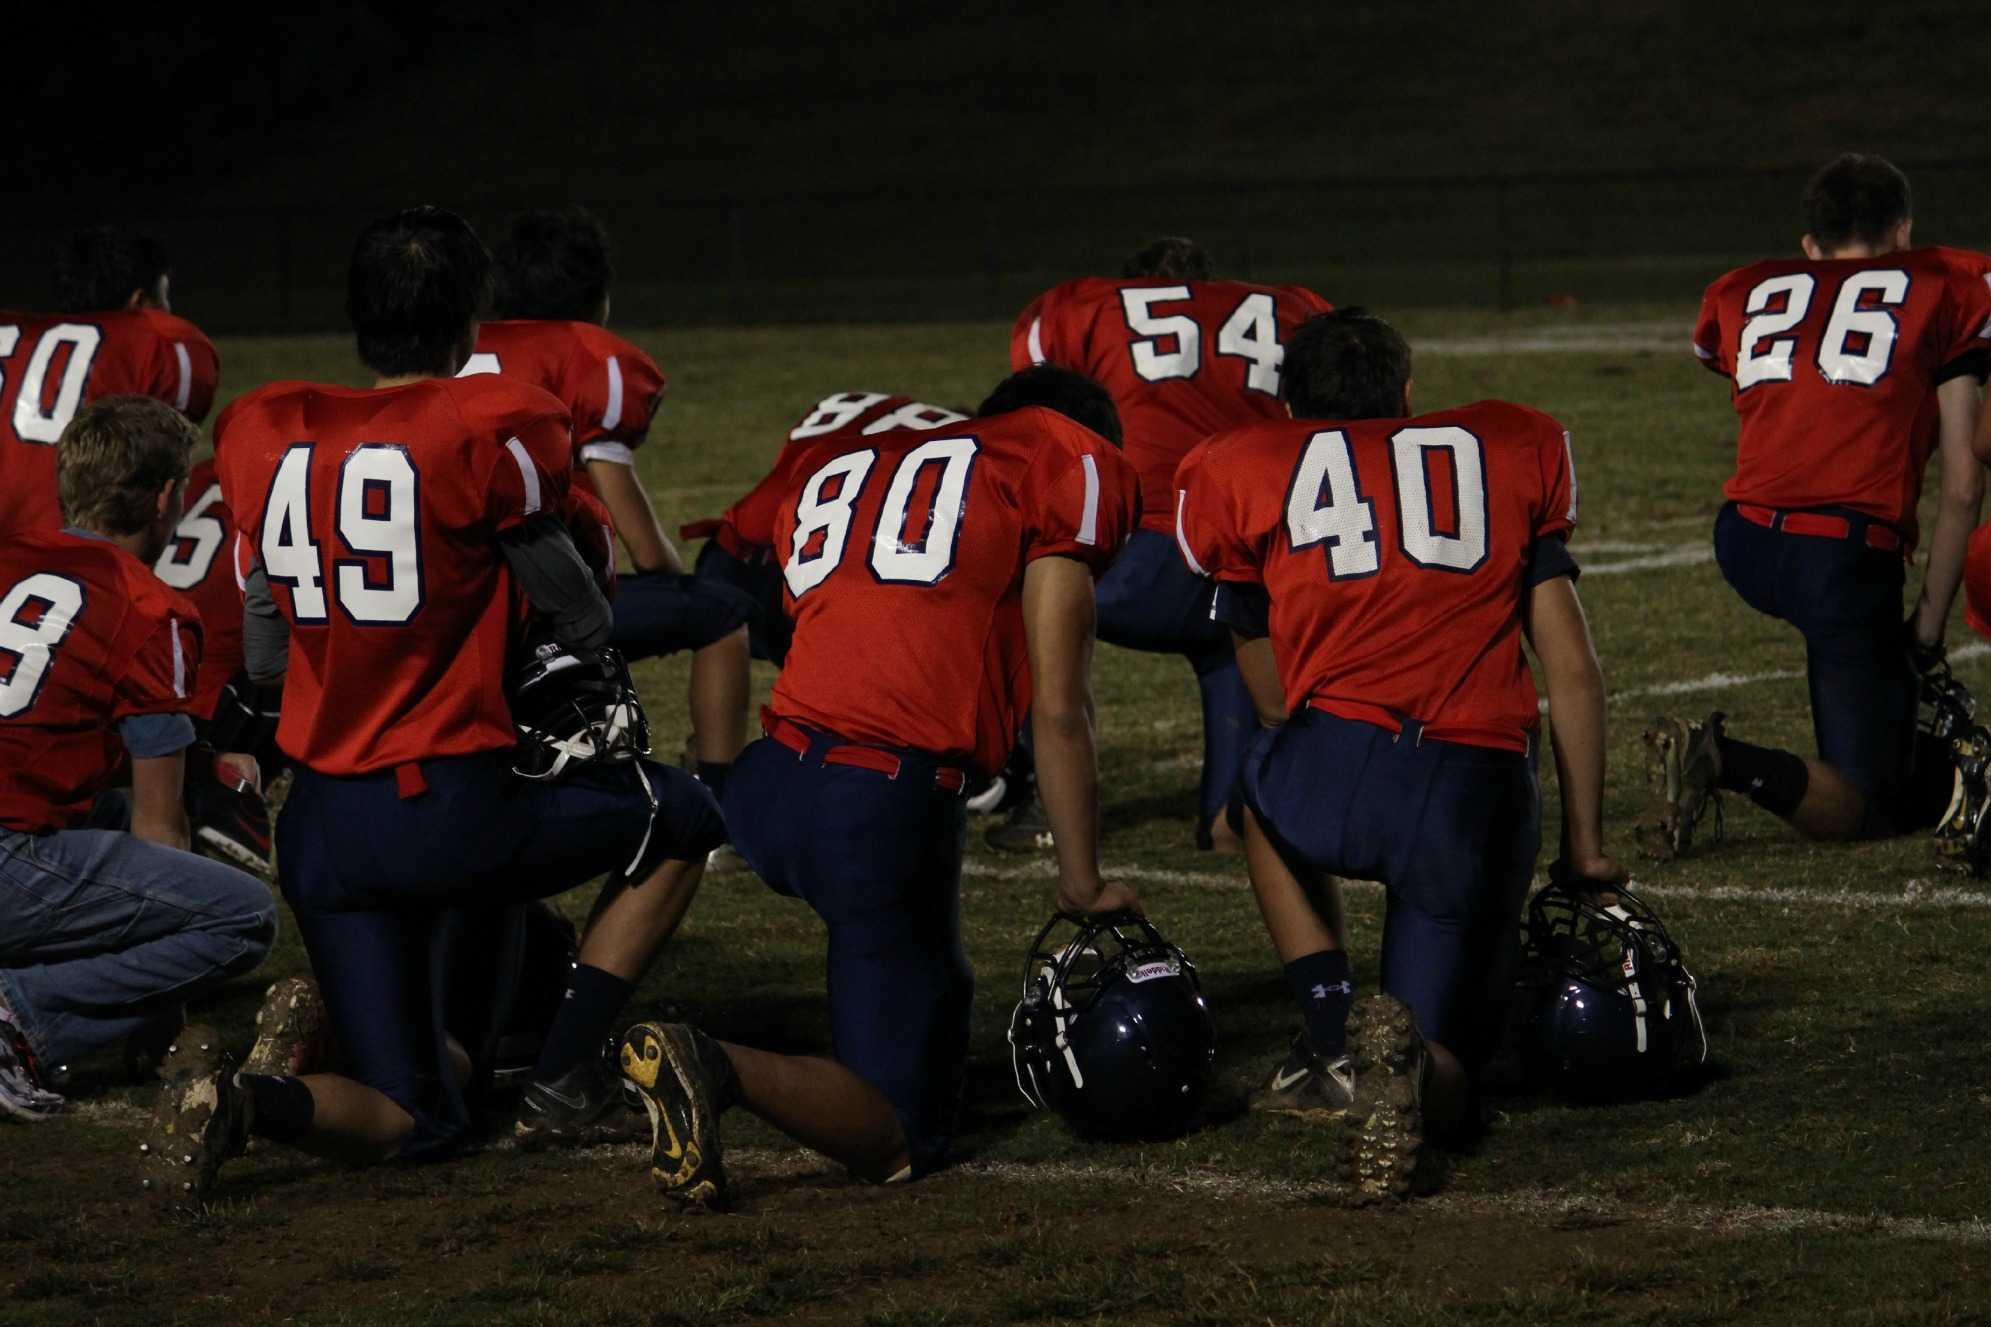 Jefferson players kneel in respect for injured junior Daven Kim.